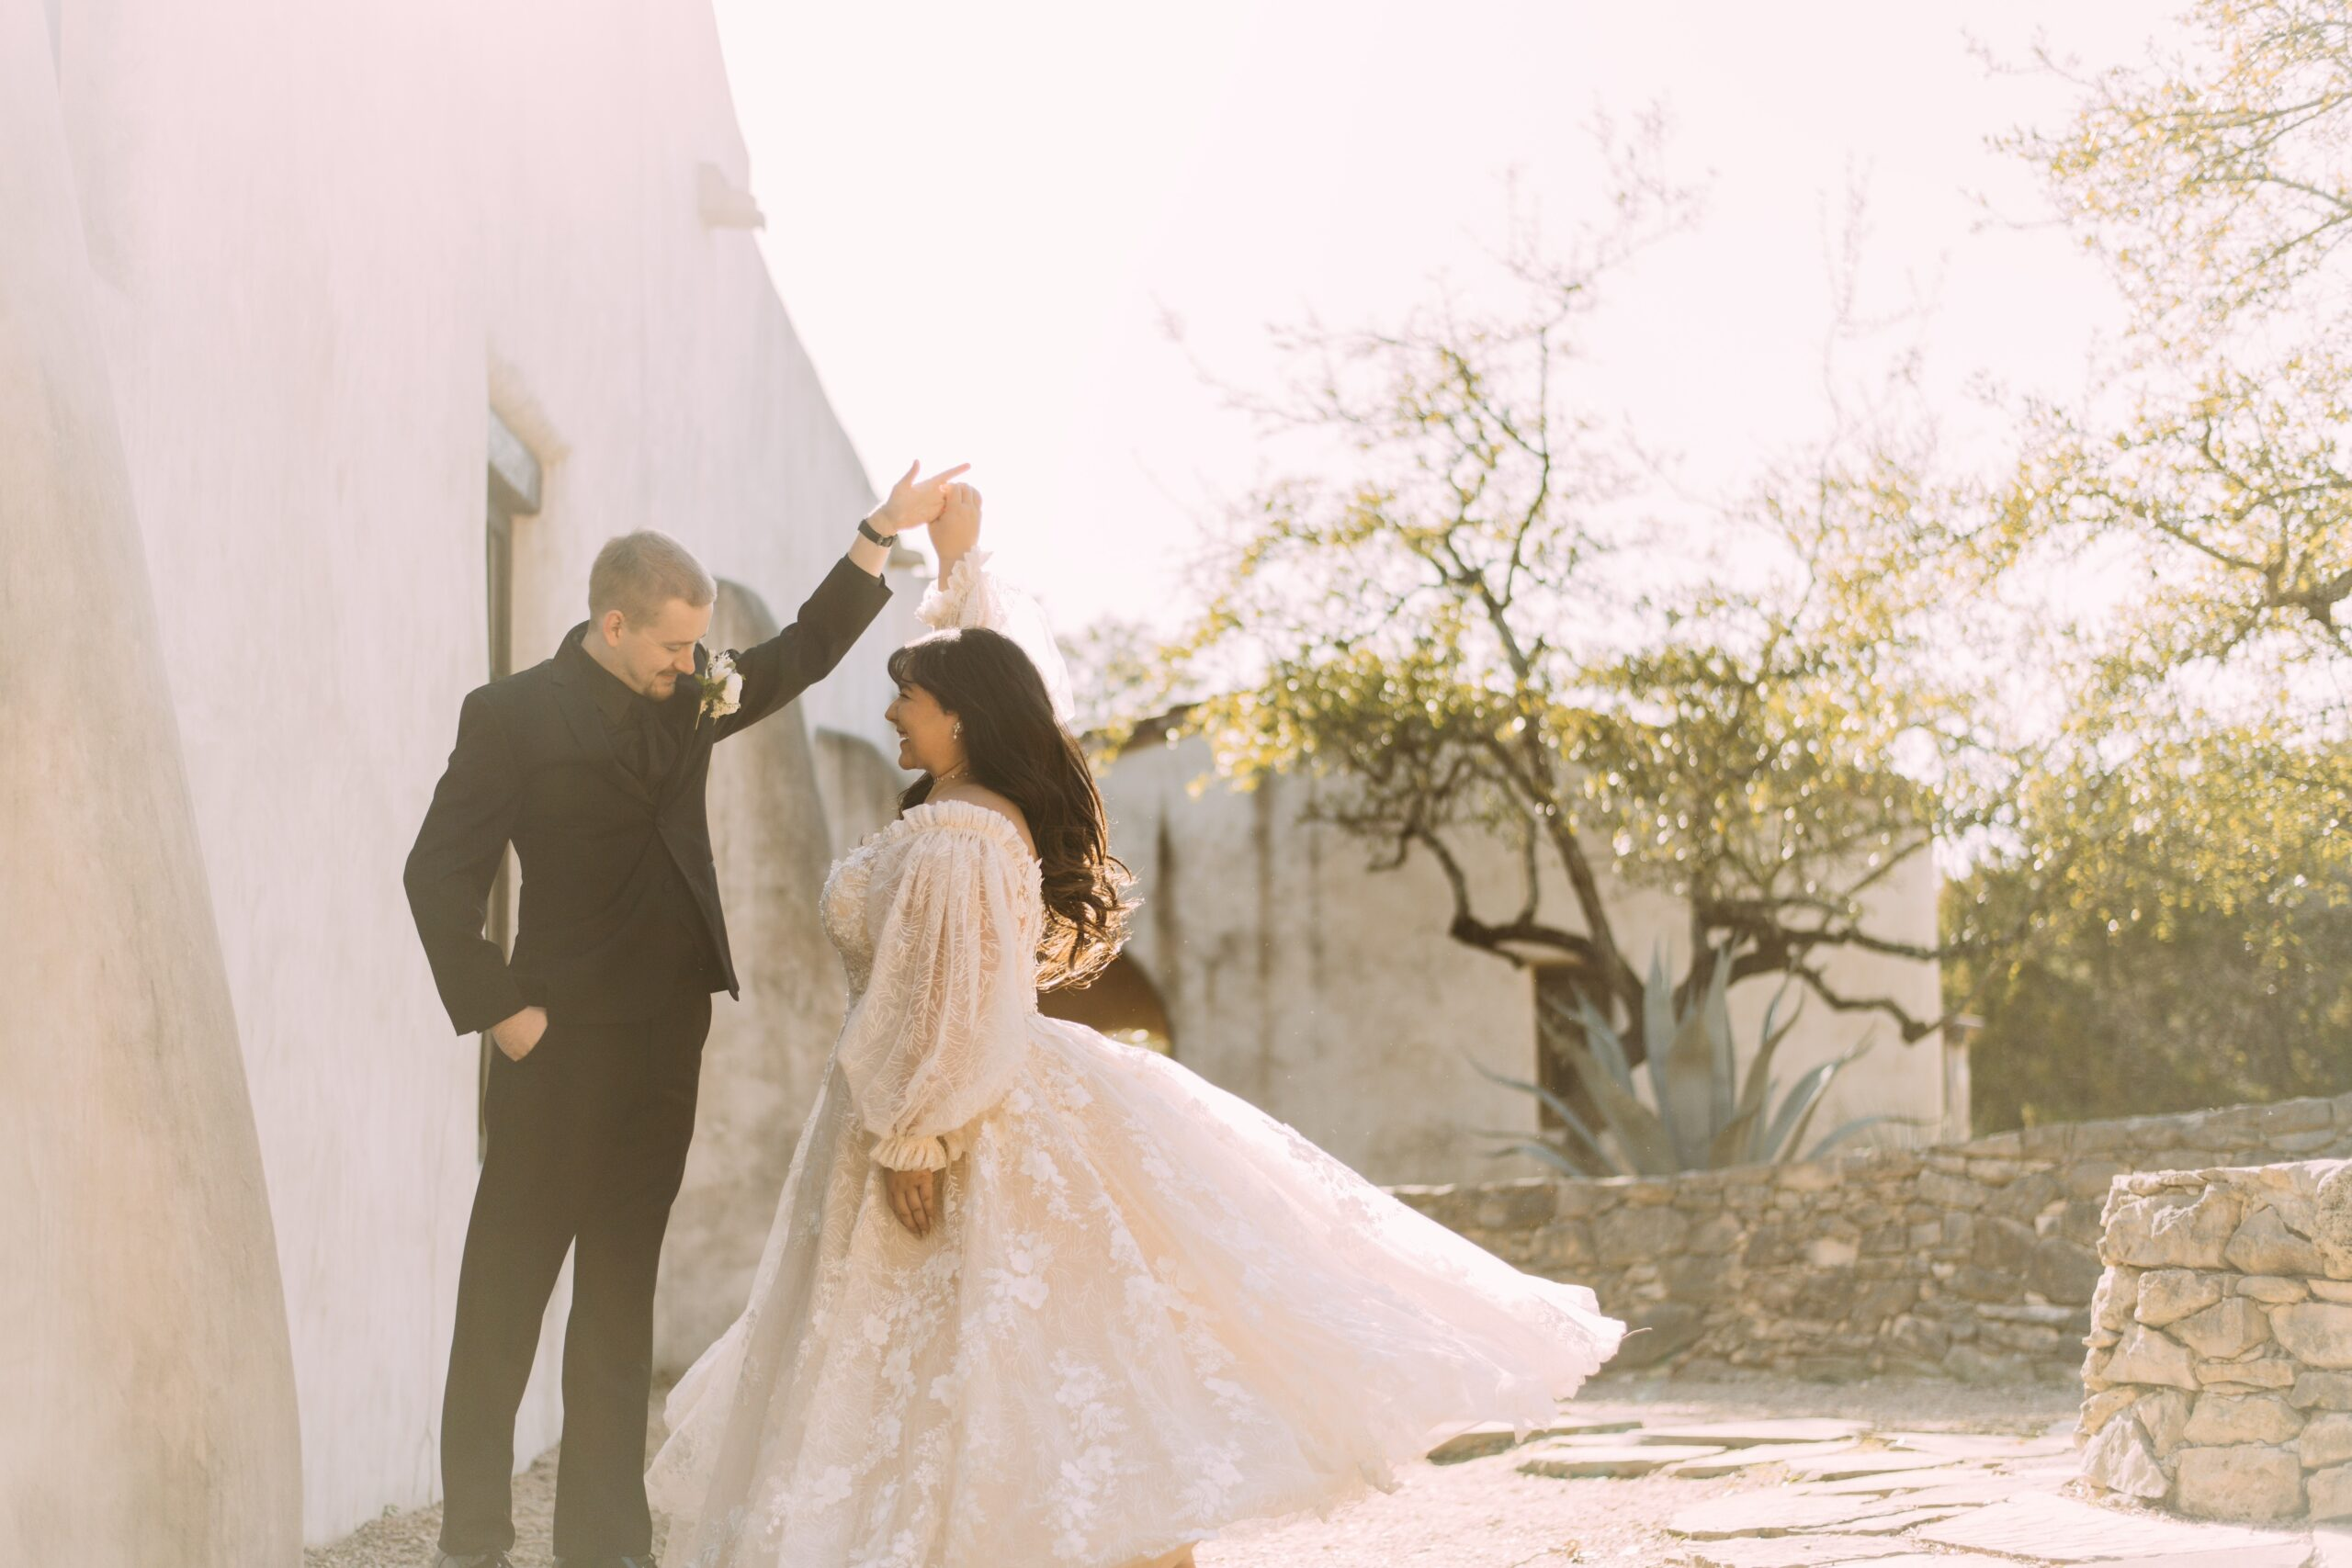 San Antonio Weddings couple, Alyssa and Brandon, at Lost Missions